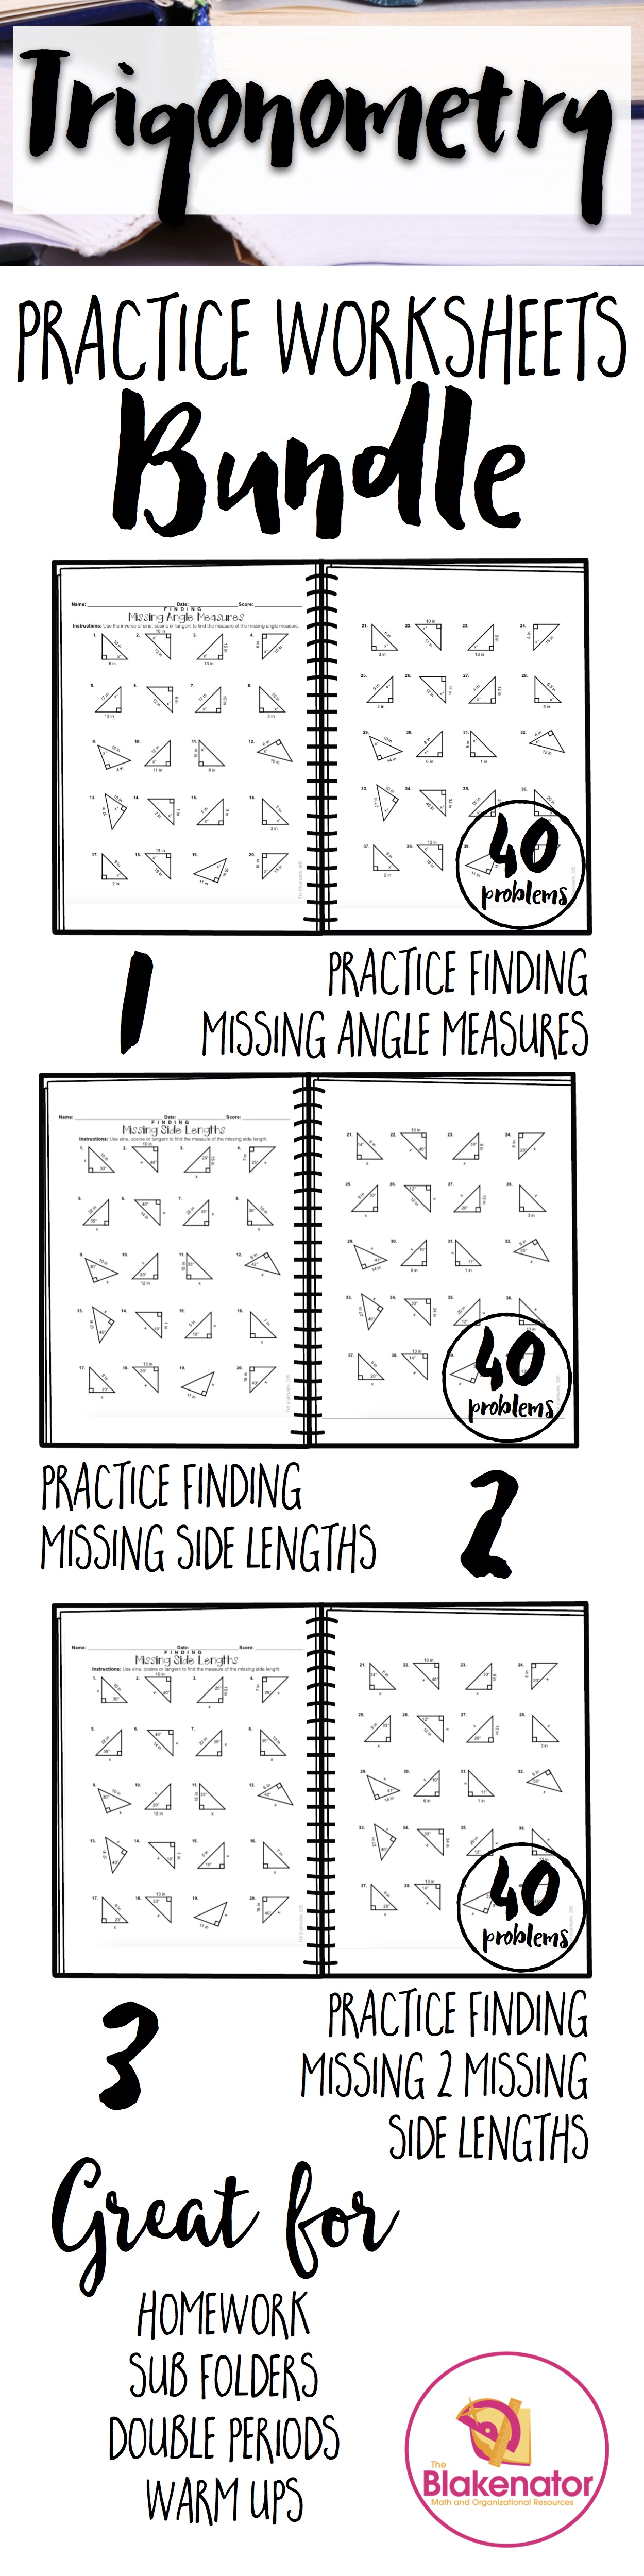 Trigonometry Worksheet Bundle